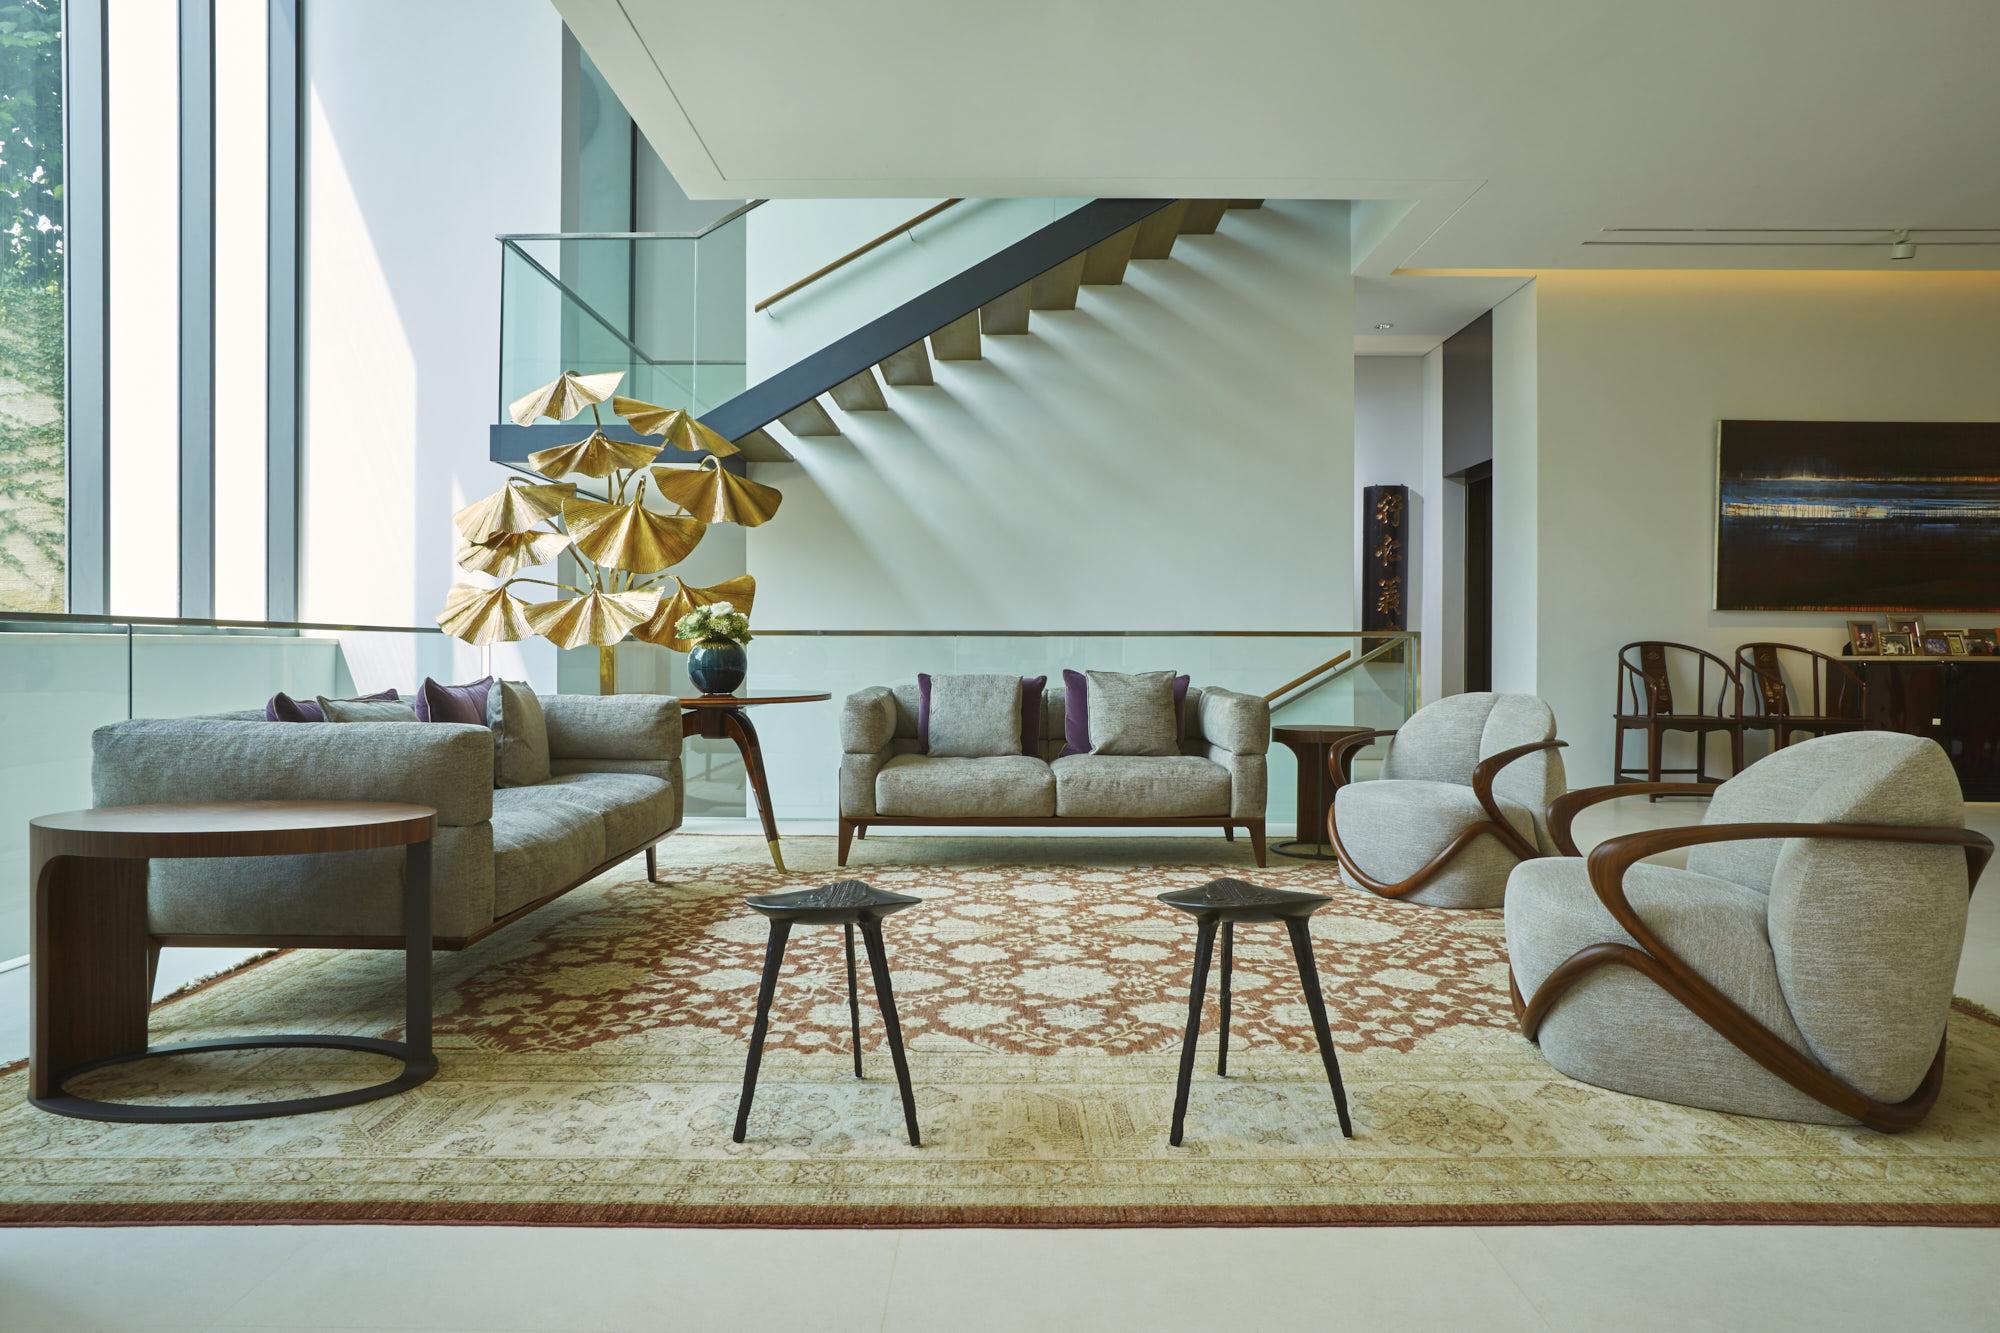 Nassim_Living Room 2_147_Final.jpg